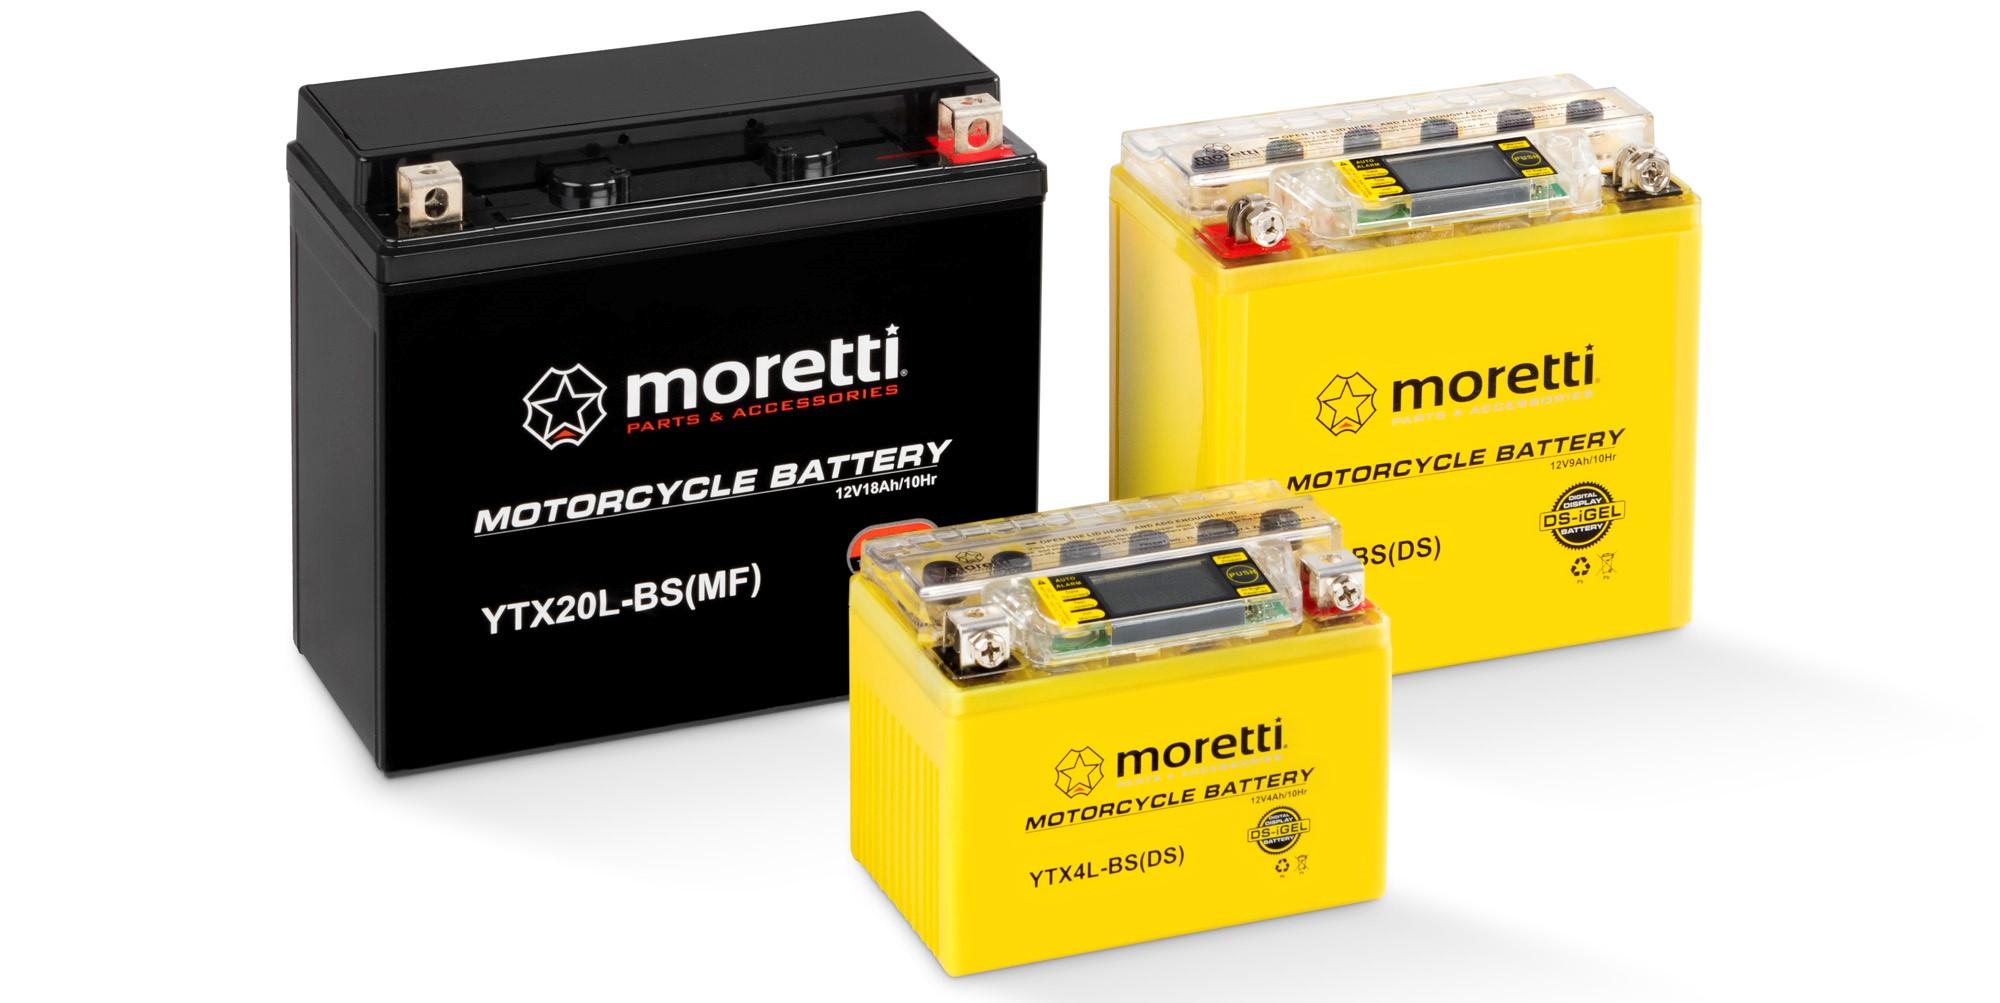 Moretti Parts - akumulatory Moretti